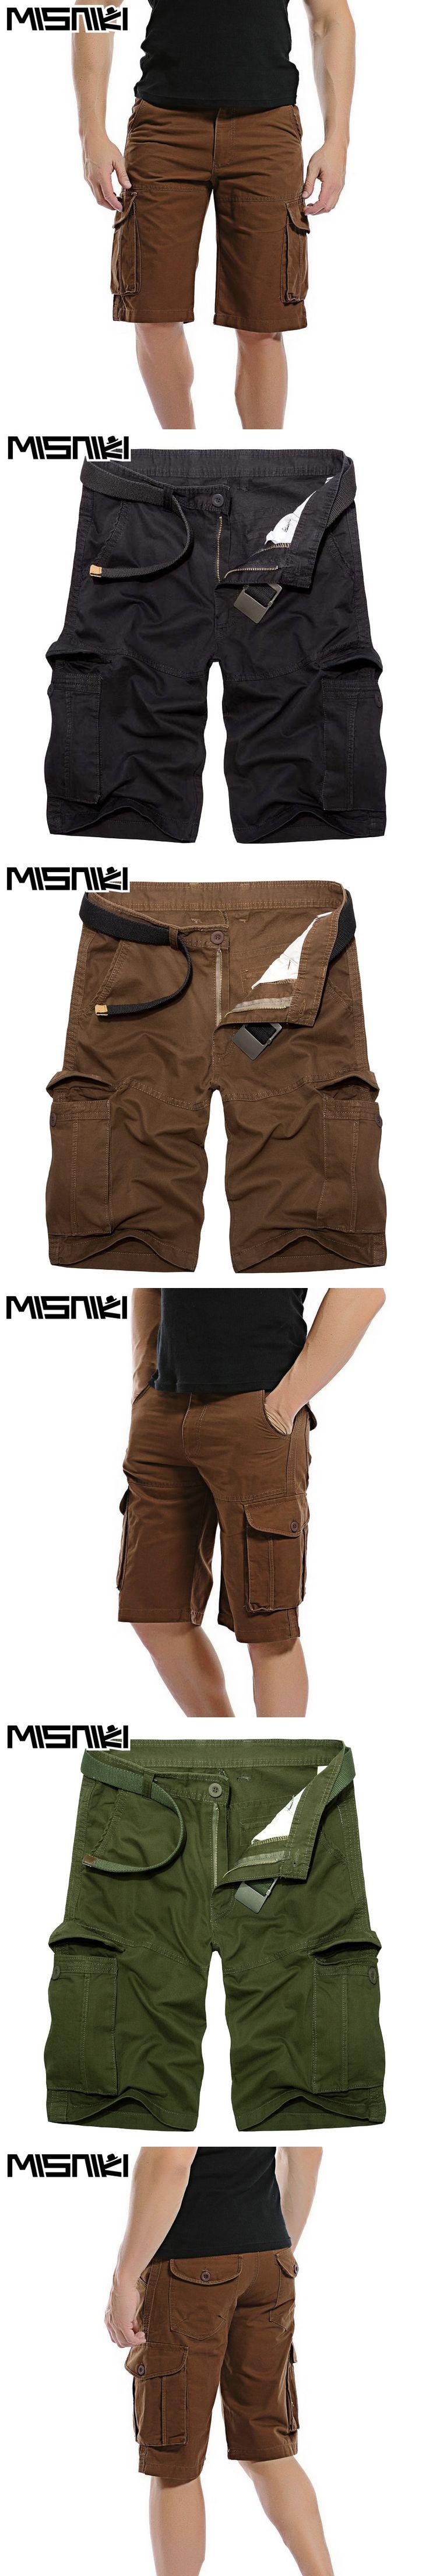 MISNIKI Summer Cargo Shorts For Men 2017 Casual Slim Cotton Solid Mens Shorts